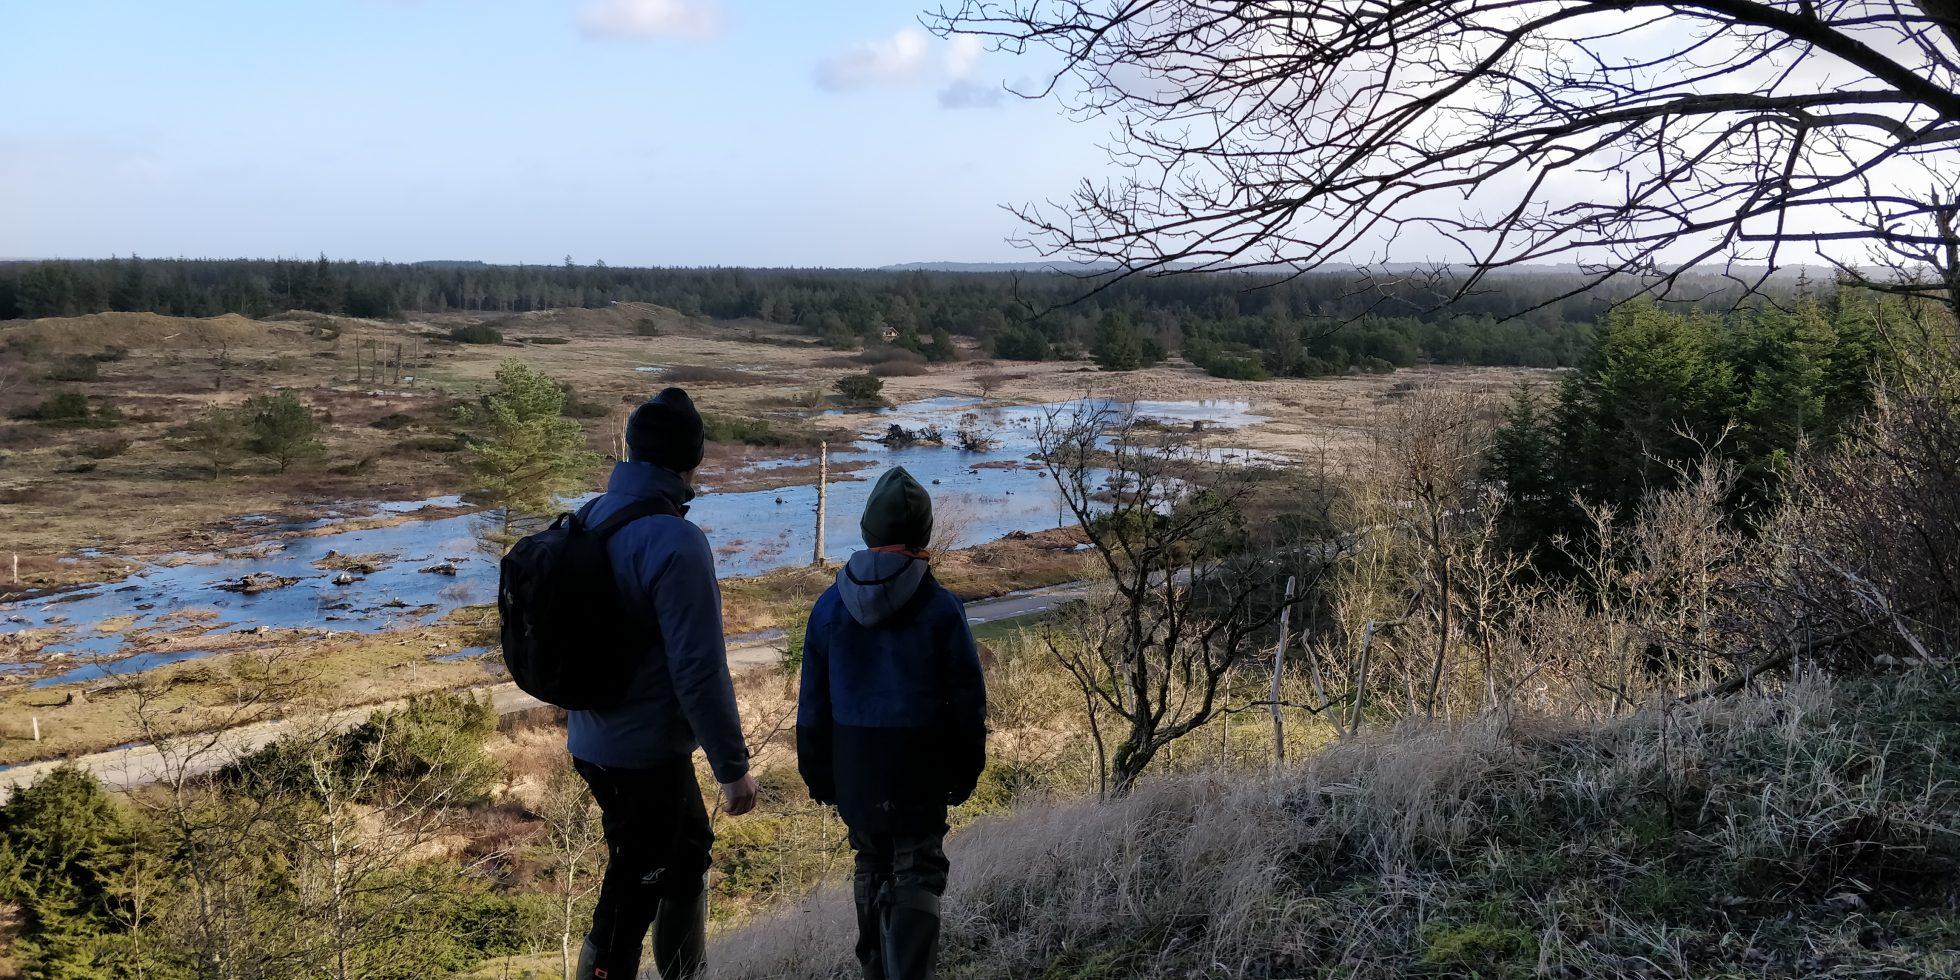 Ud i naturen i virusfrit terræn NaturGuide.dk Danmarks